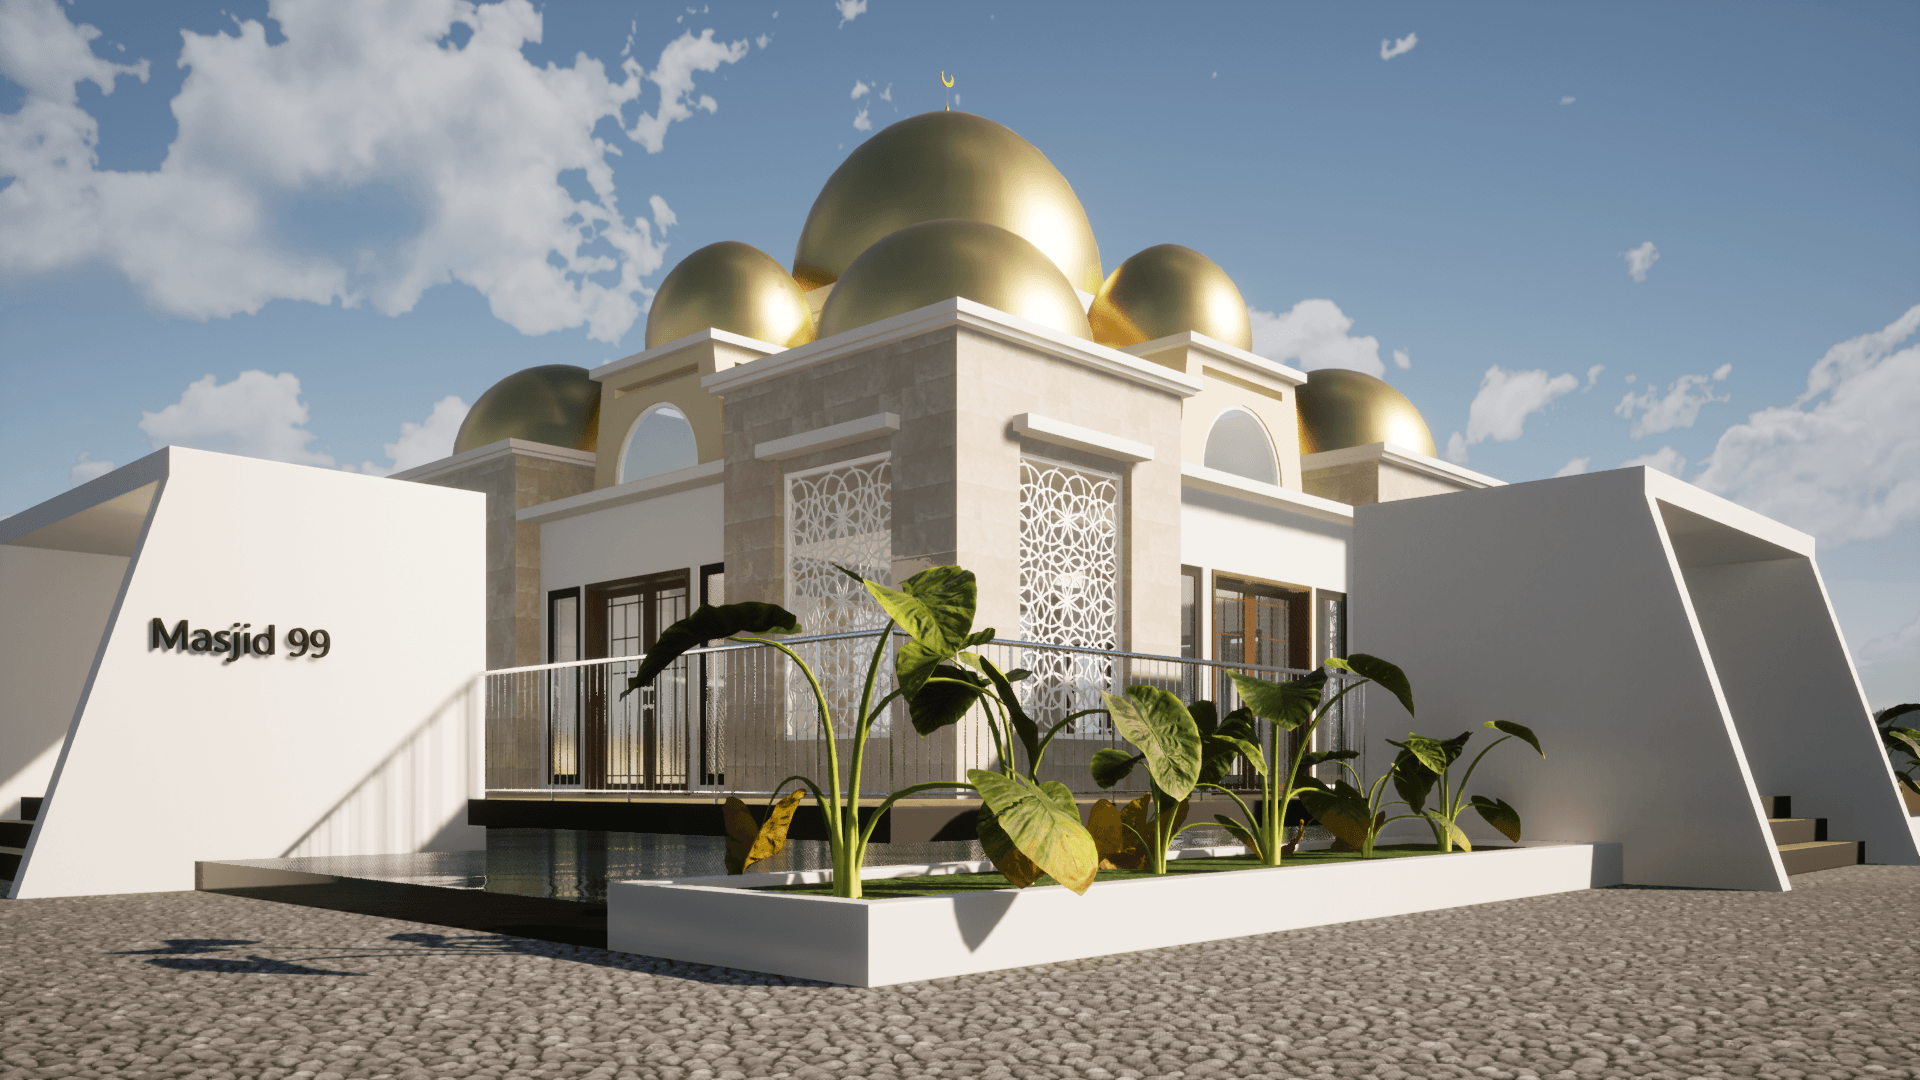 Jasa Interior Desainer Arief Monoarfa di Palu